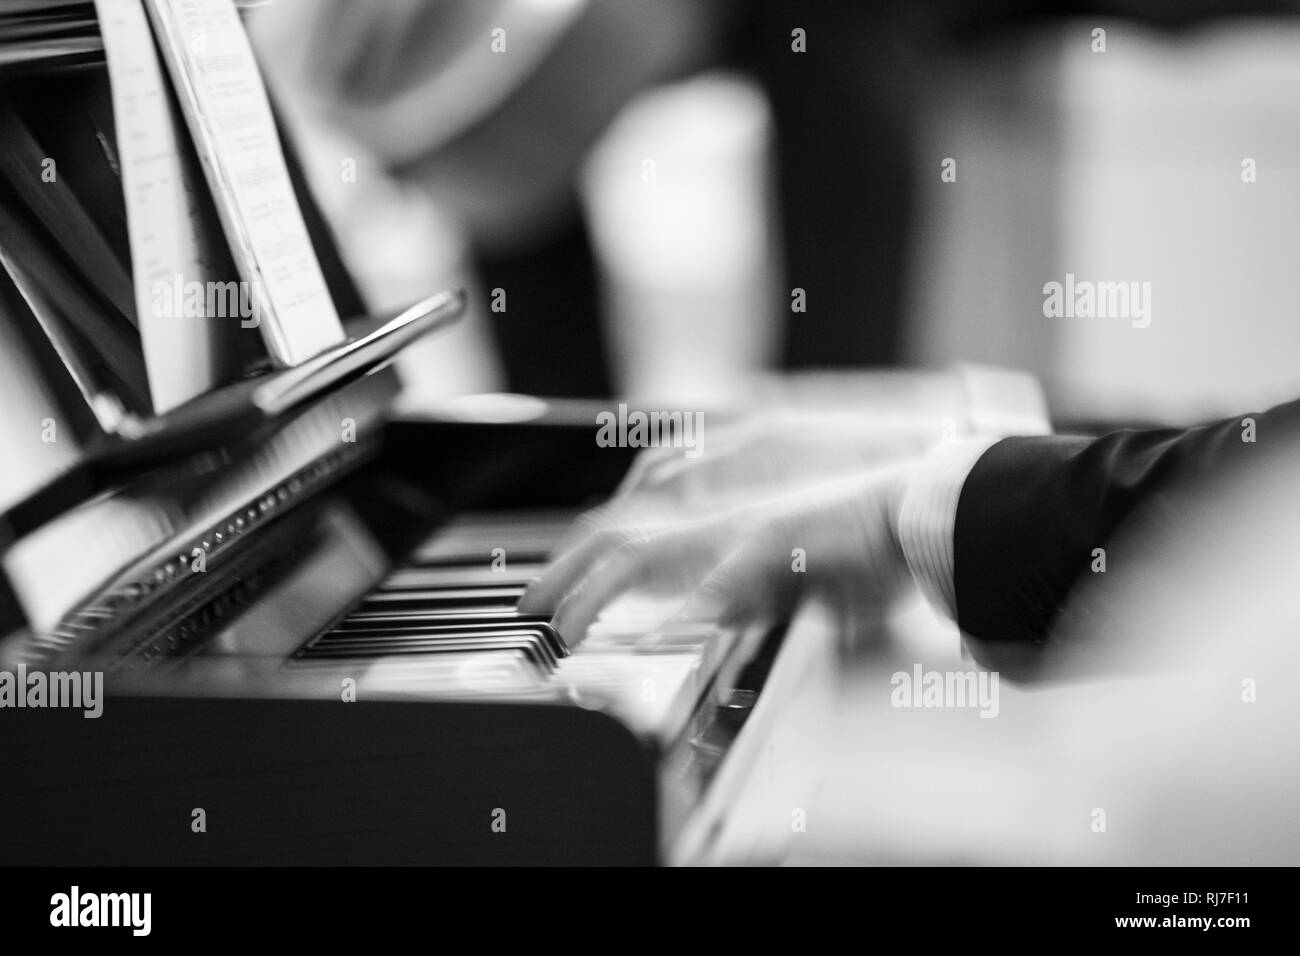 Hände am Klavier in Bewegung - Stock Image